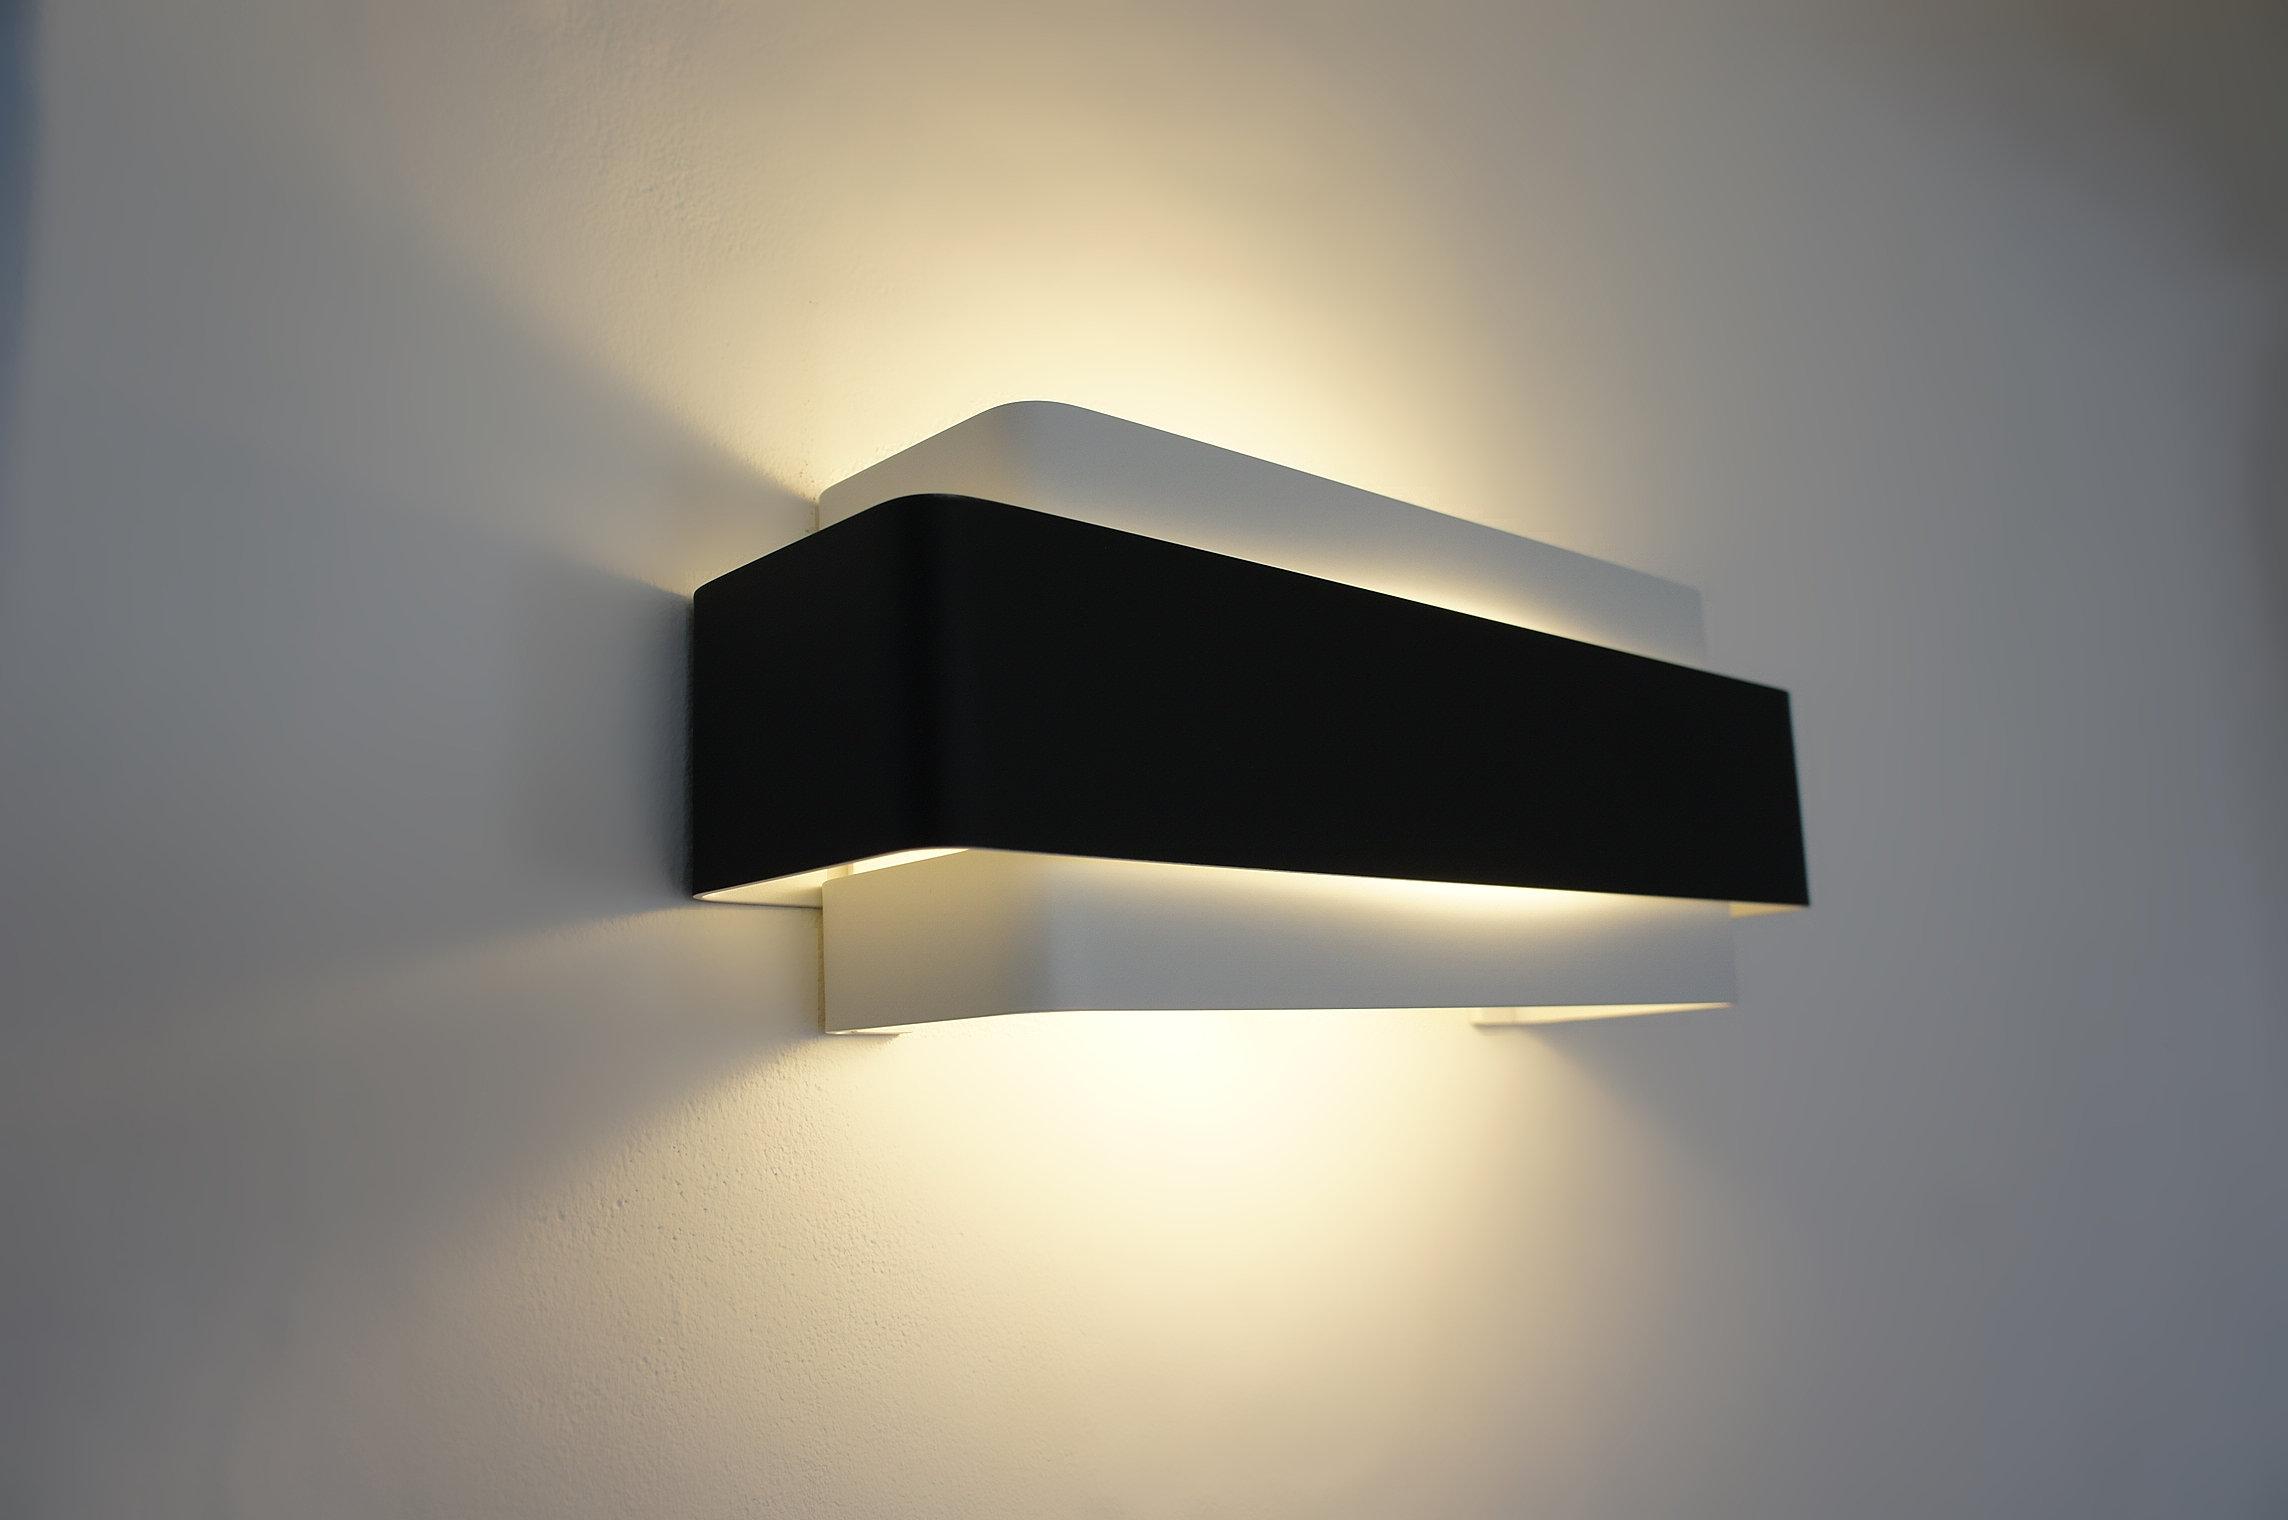 ... Moderniste-lampe design sur mesure  applique design contemporain